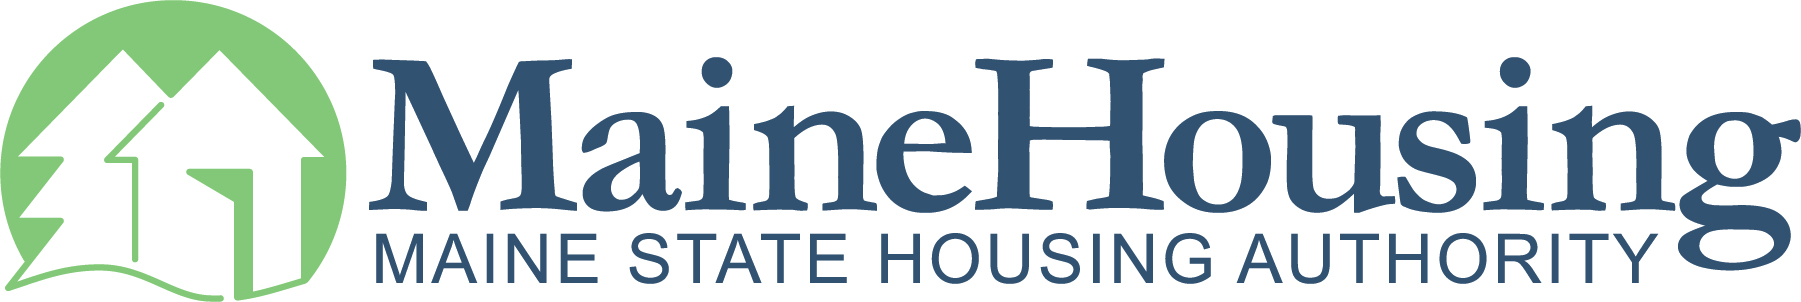 Maine State Housing Authority